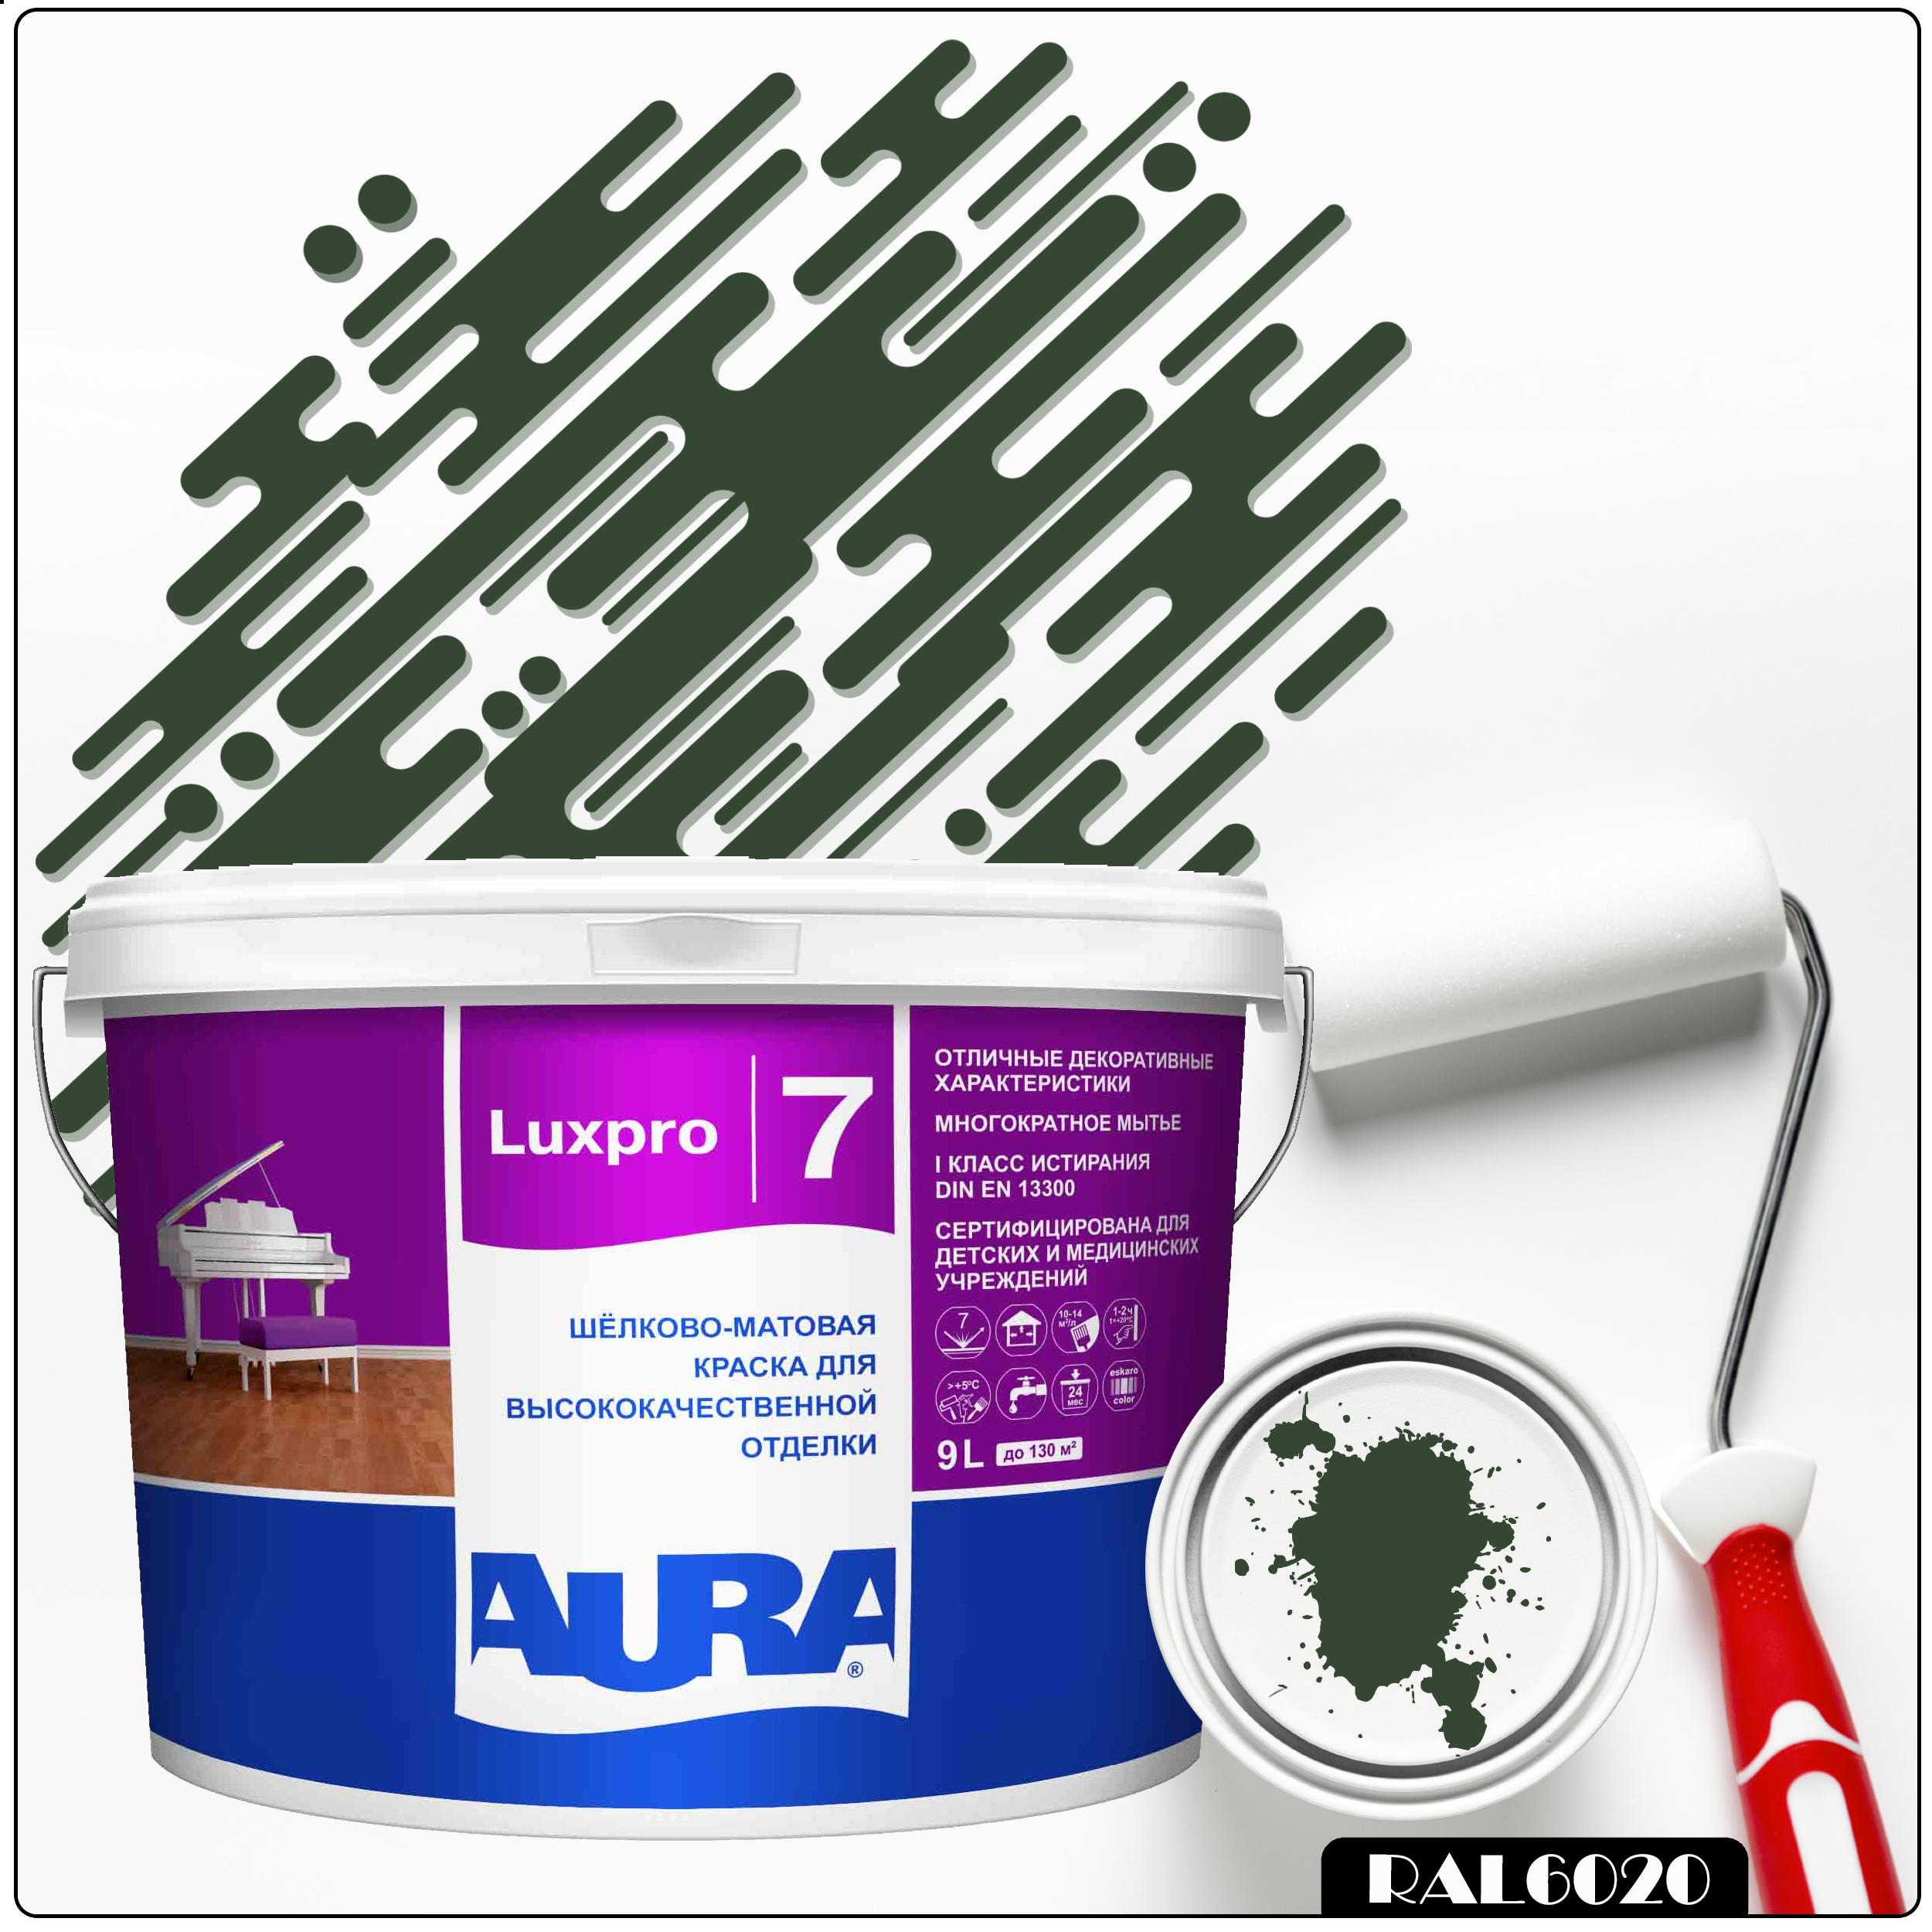 Фото 21 - Краска Aura LuxPRO 7, RAL 6020 Зеленый хром, латексная, шелково-матовая, интерьерная, 9л, Аура.